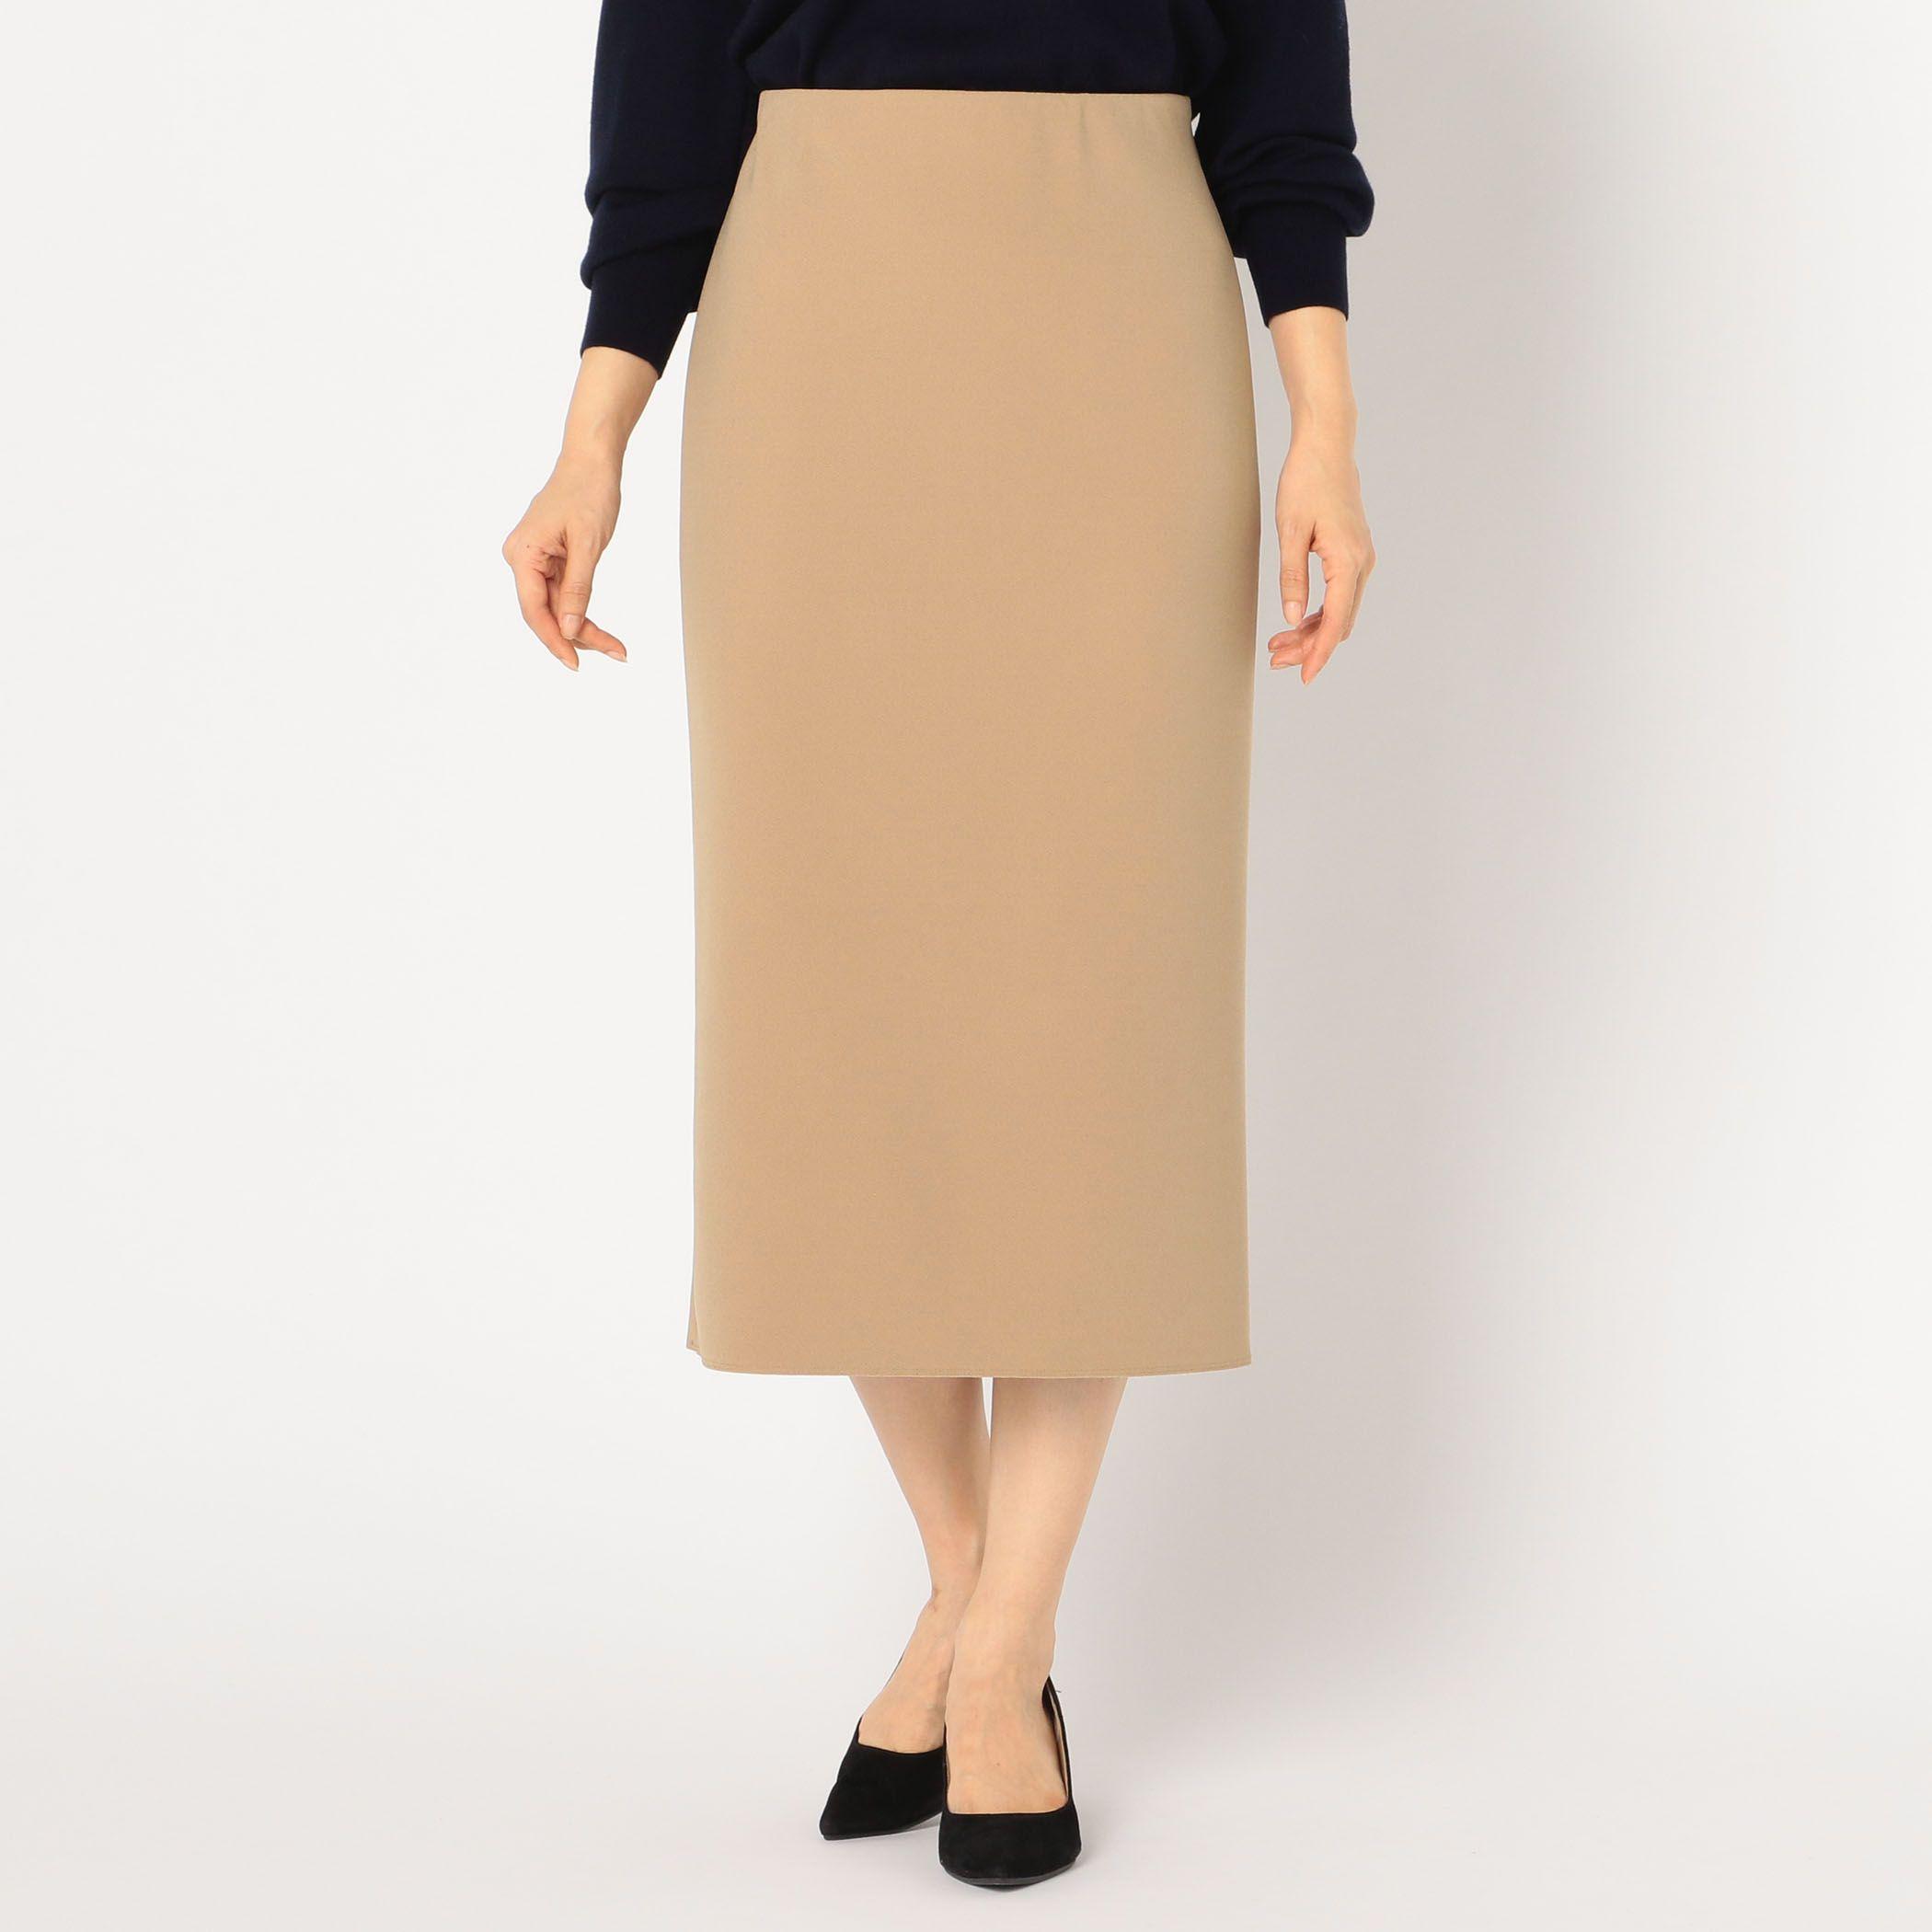 NOLLEY'Ssophiノーリーズソフィー/インゴムロングタイトスカート